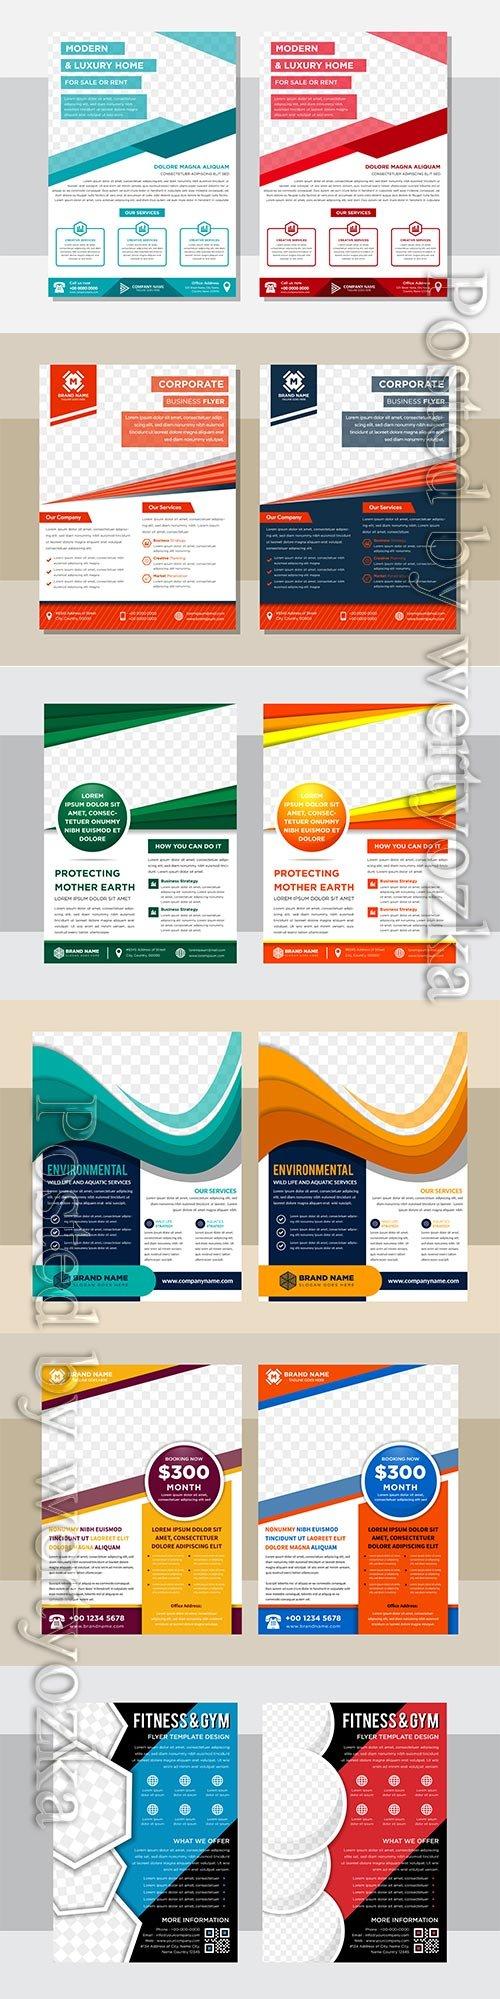 Business flyer template design, brochure vector illustration # 4